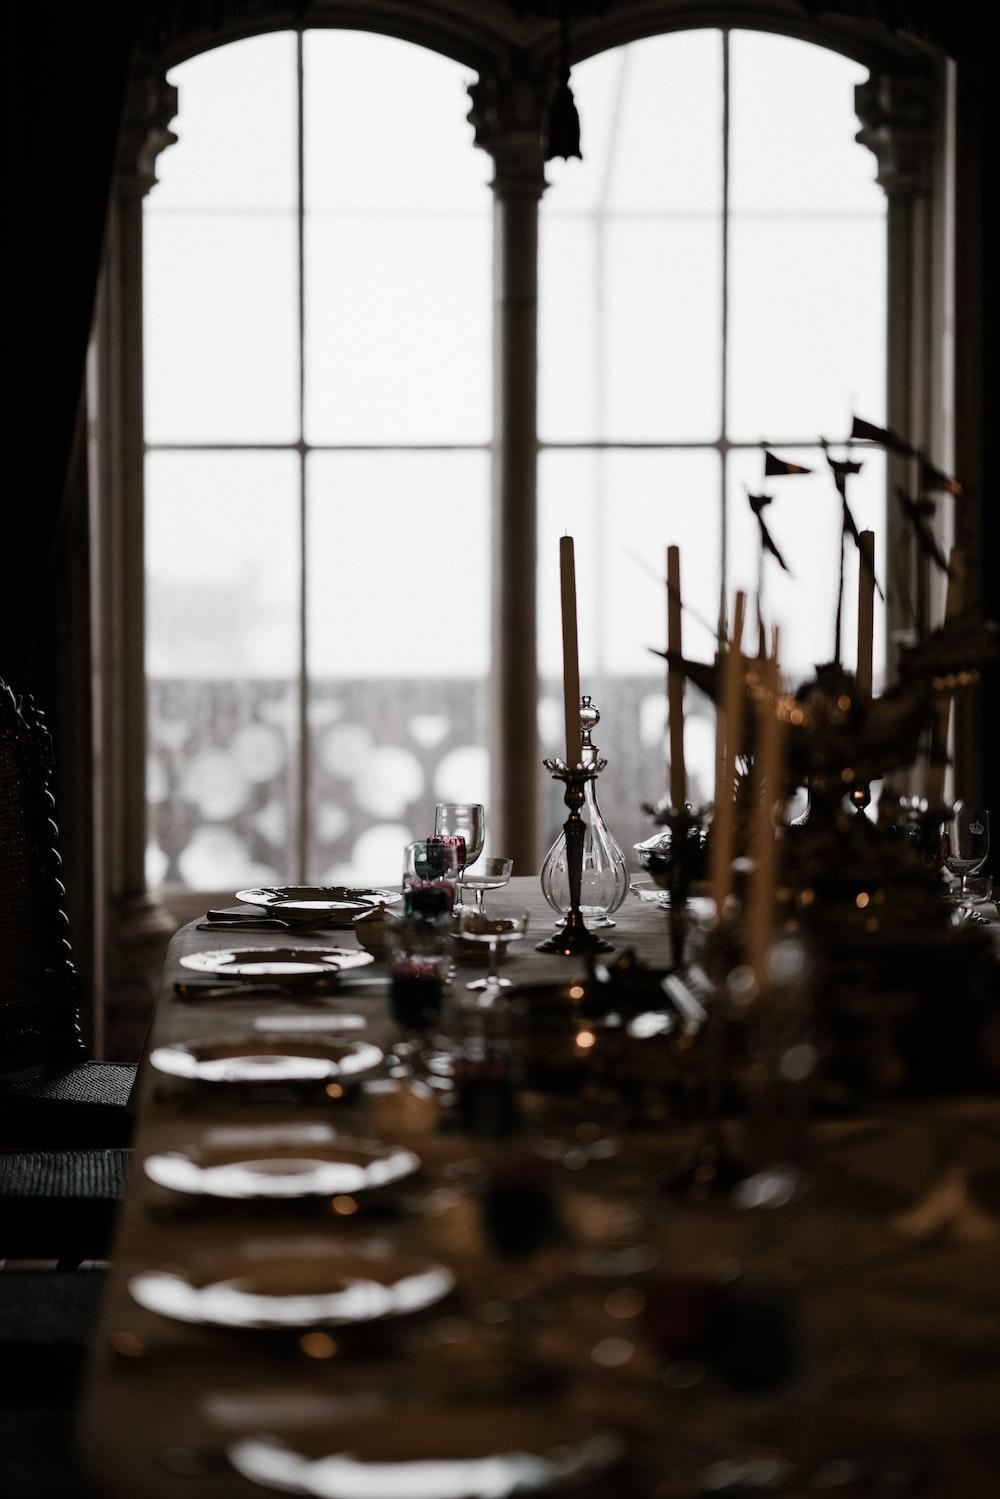 table arrangement inside room